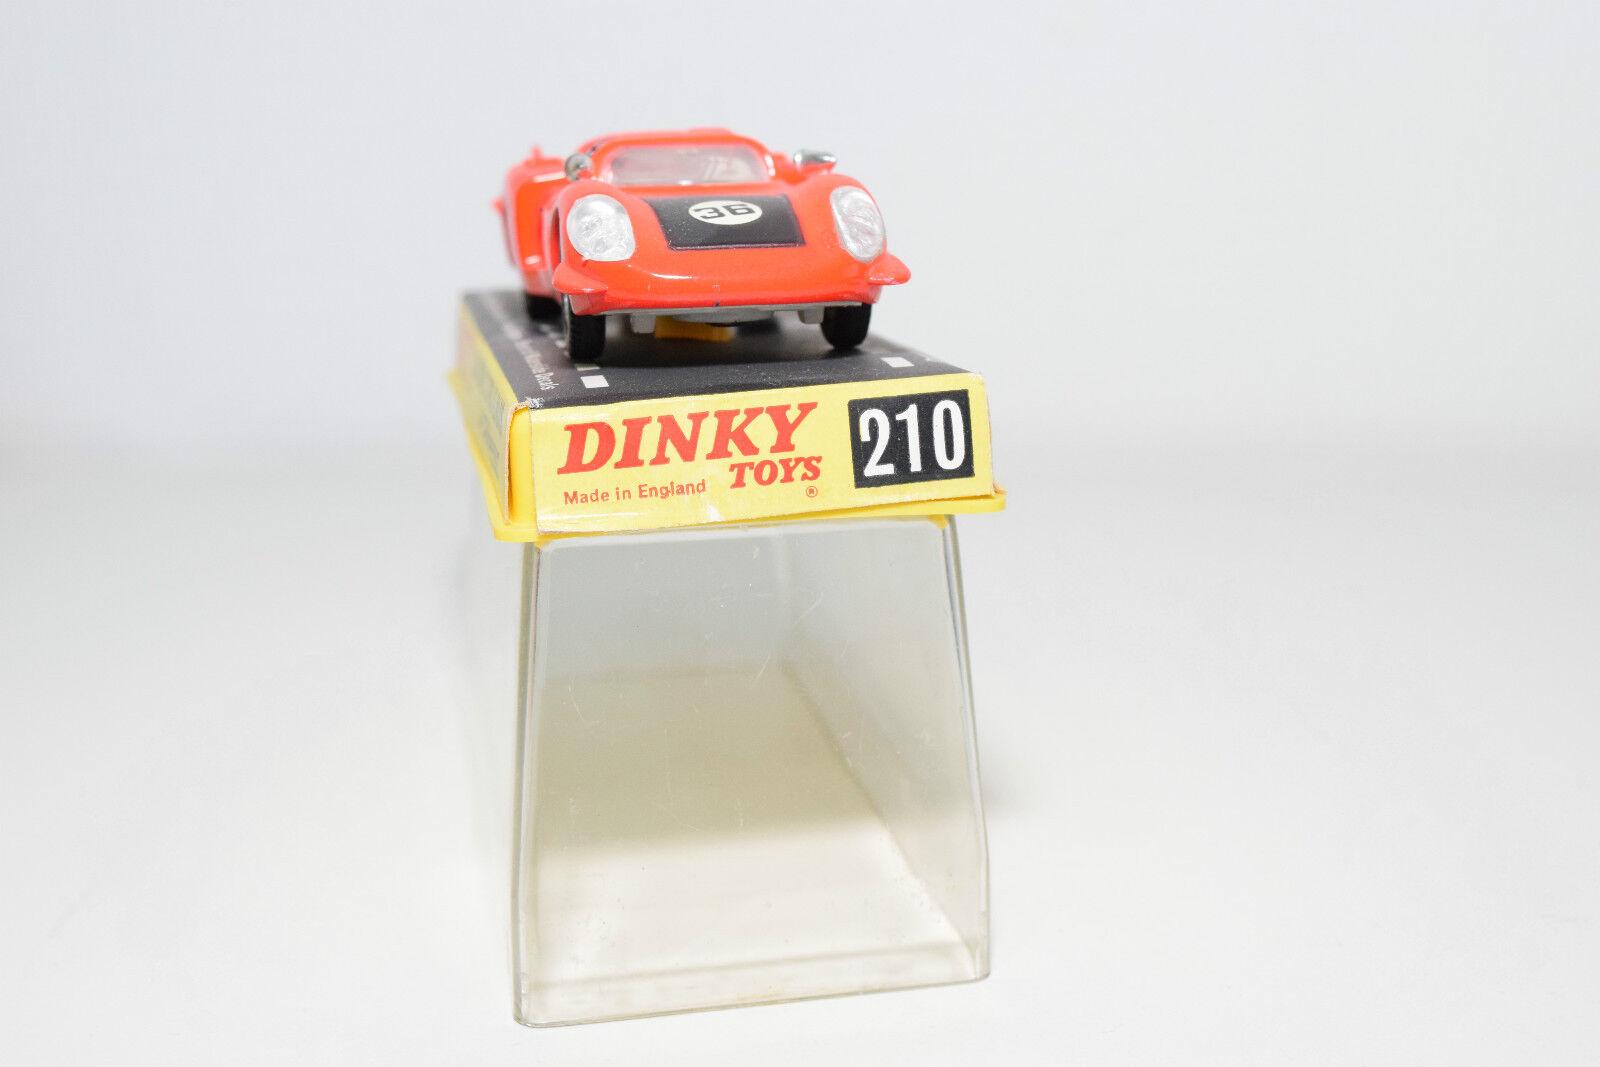 DINKY TOYS 210 ALFA ROMEO 33 TIPO LE MANS orange orange orange VERY NEAR MINT BOXED 5e4e06